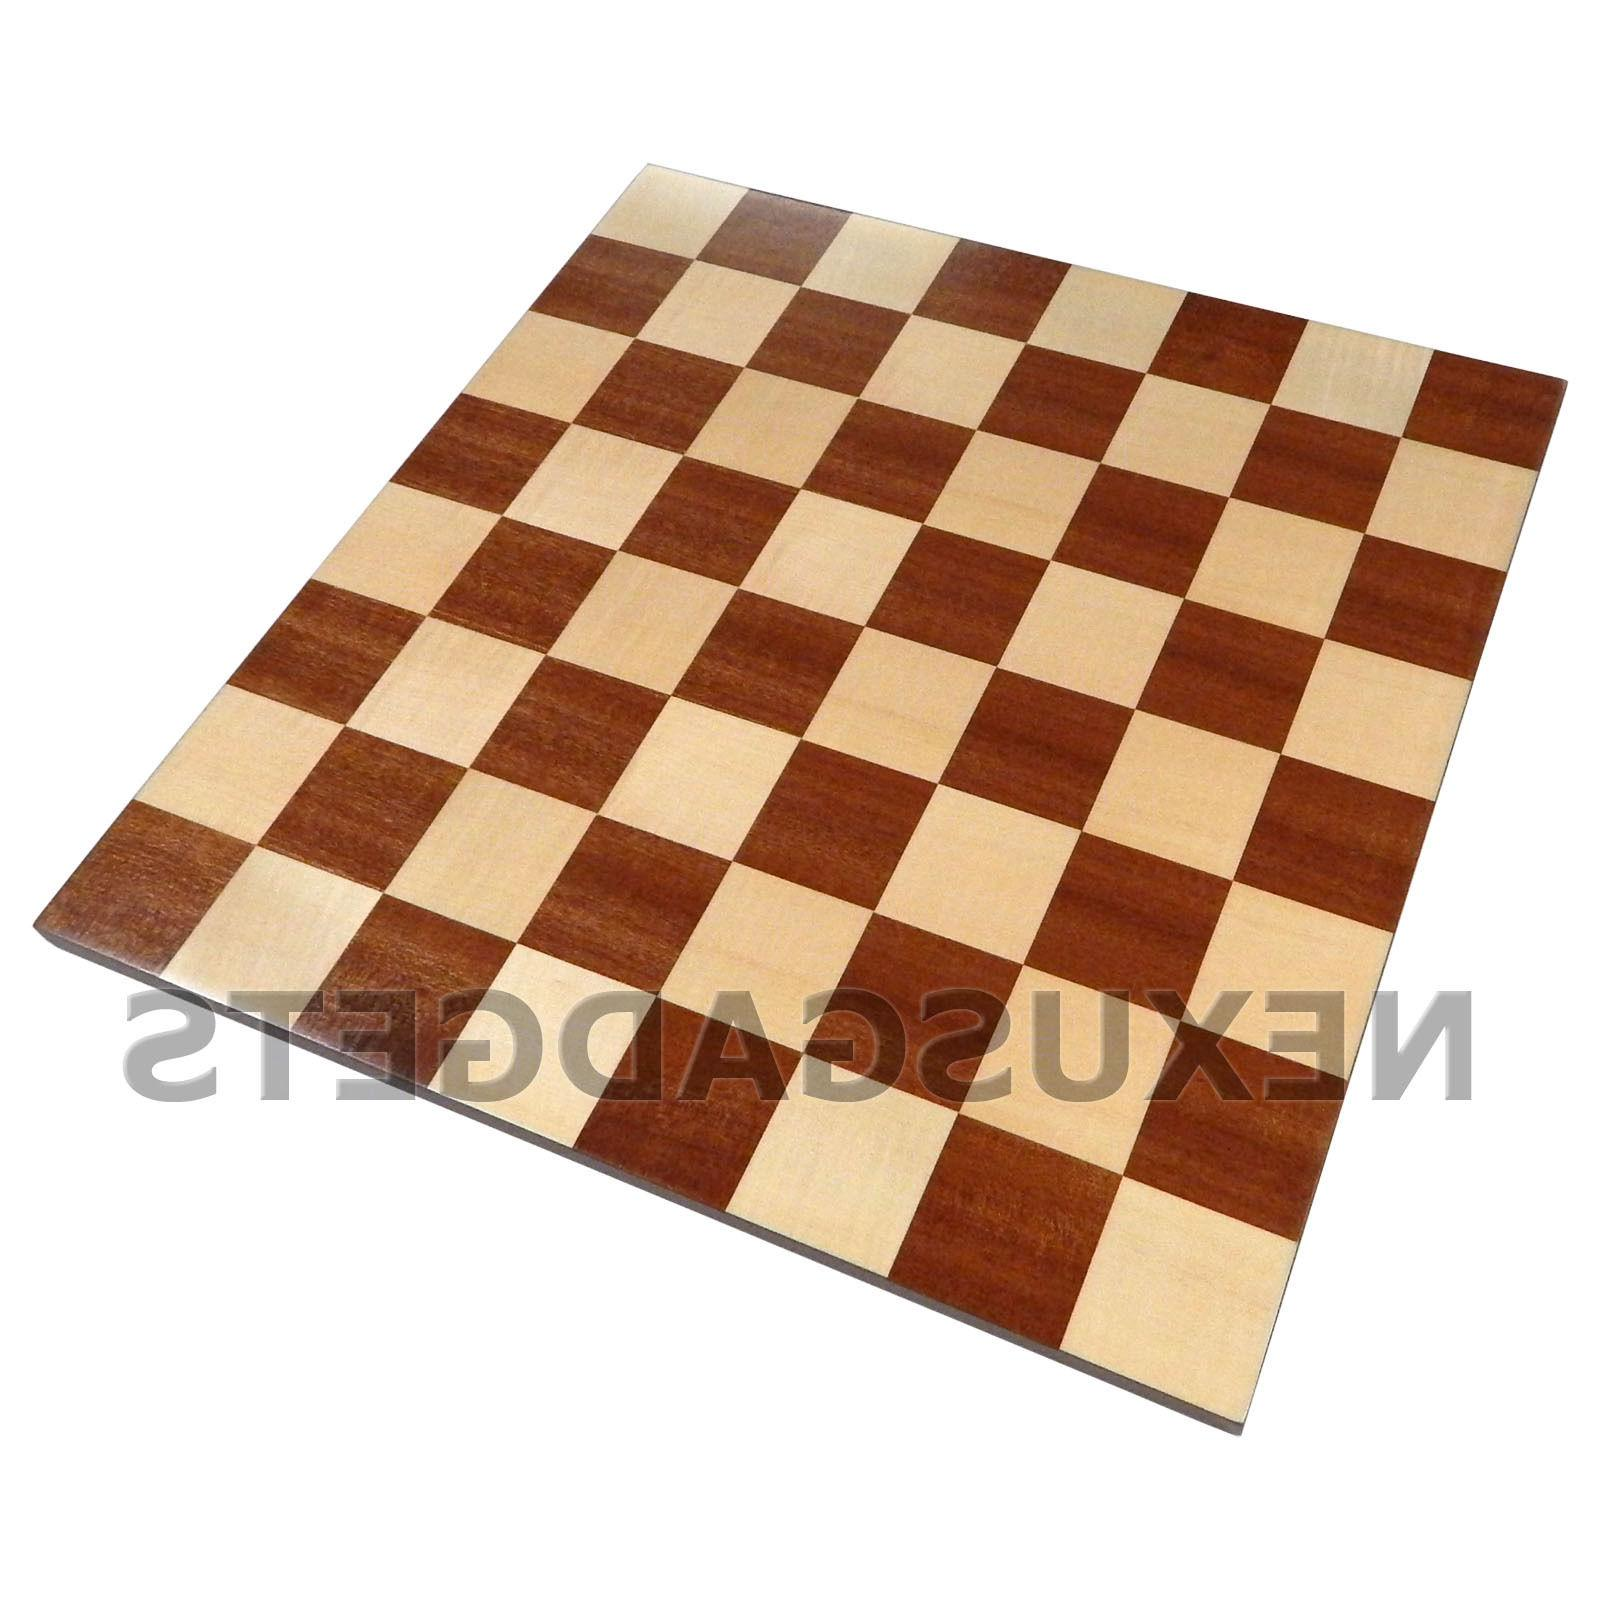 Zoric 18 Borderless Chess ONLY